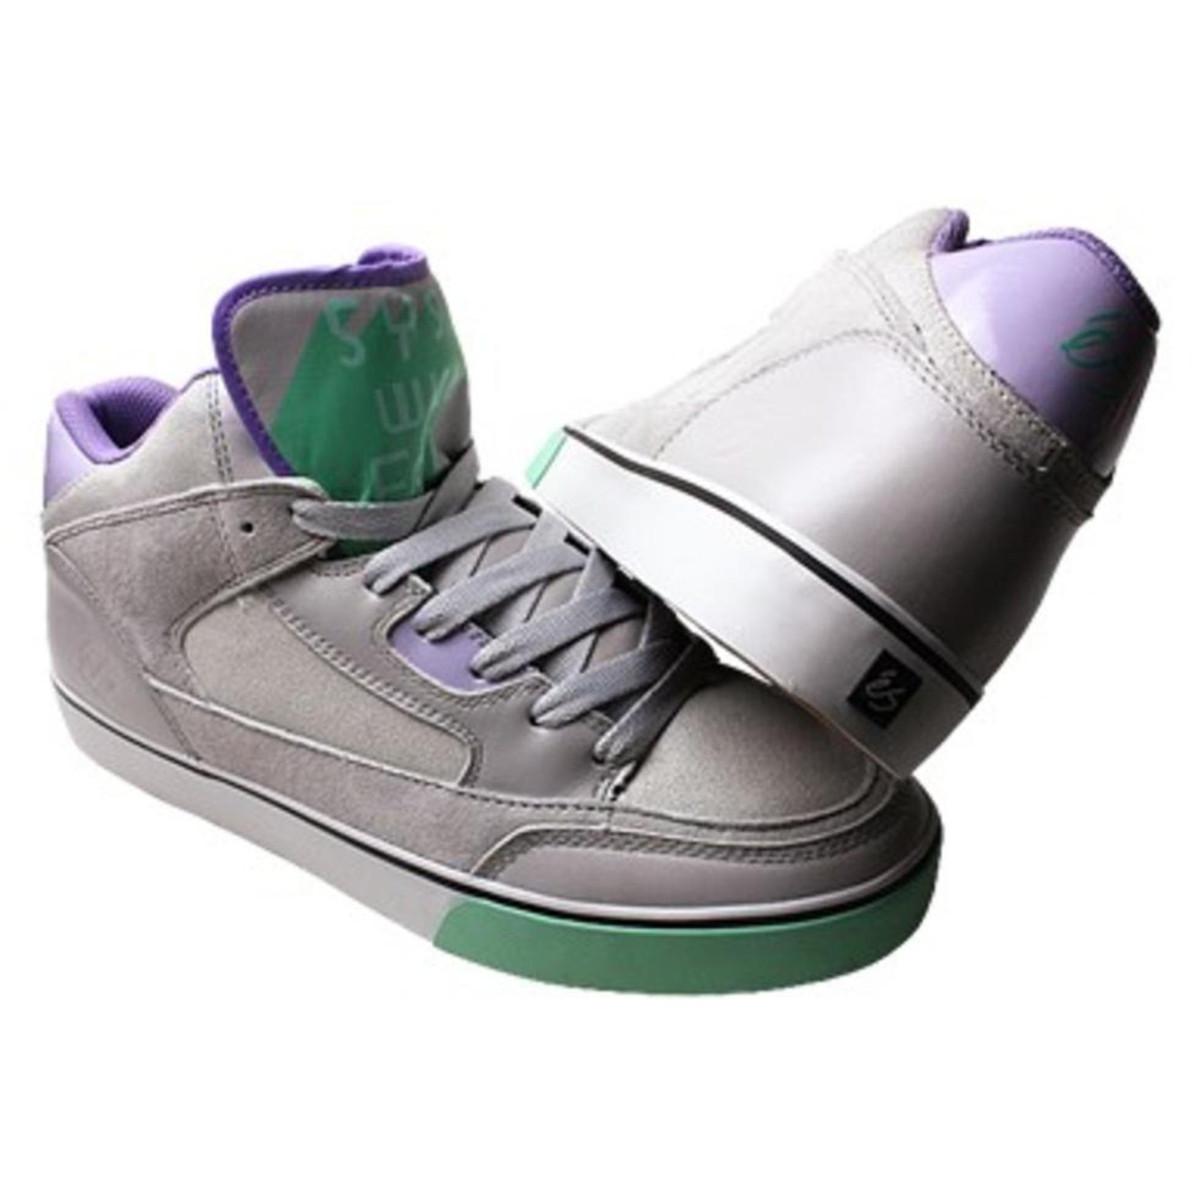 ES Footwear Skateboard Schuhe Ogi Erving grau Weiß Grün